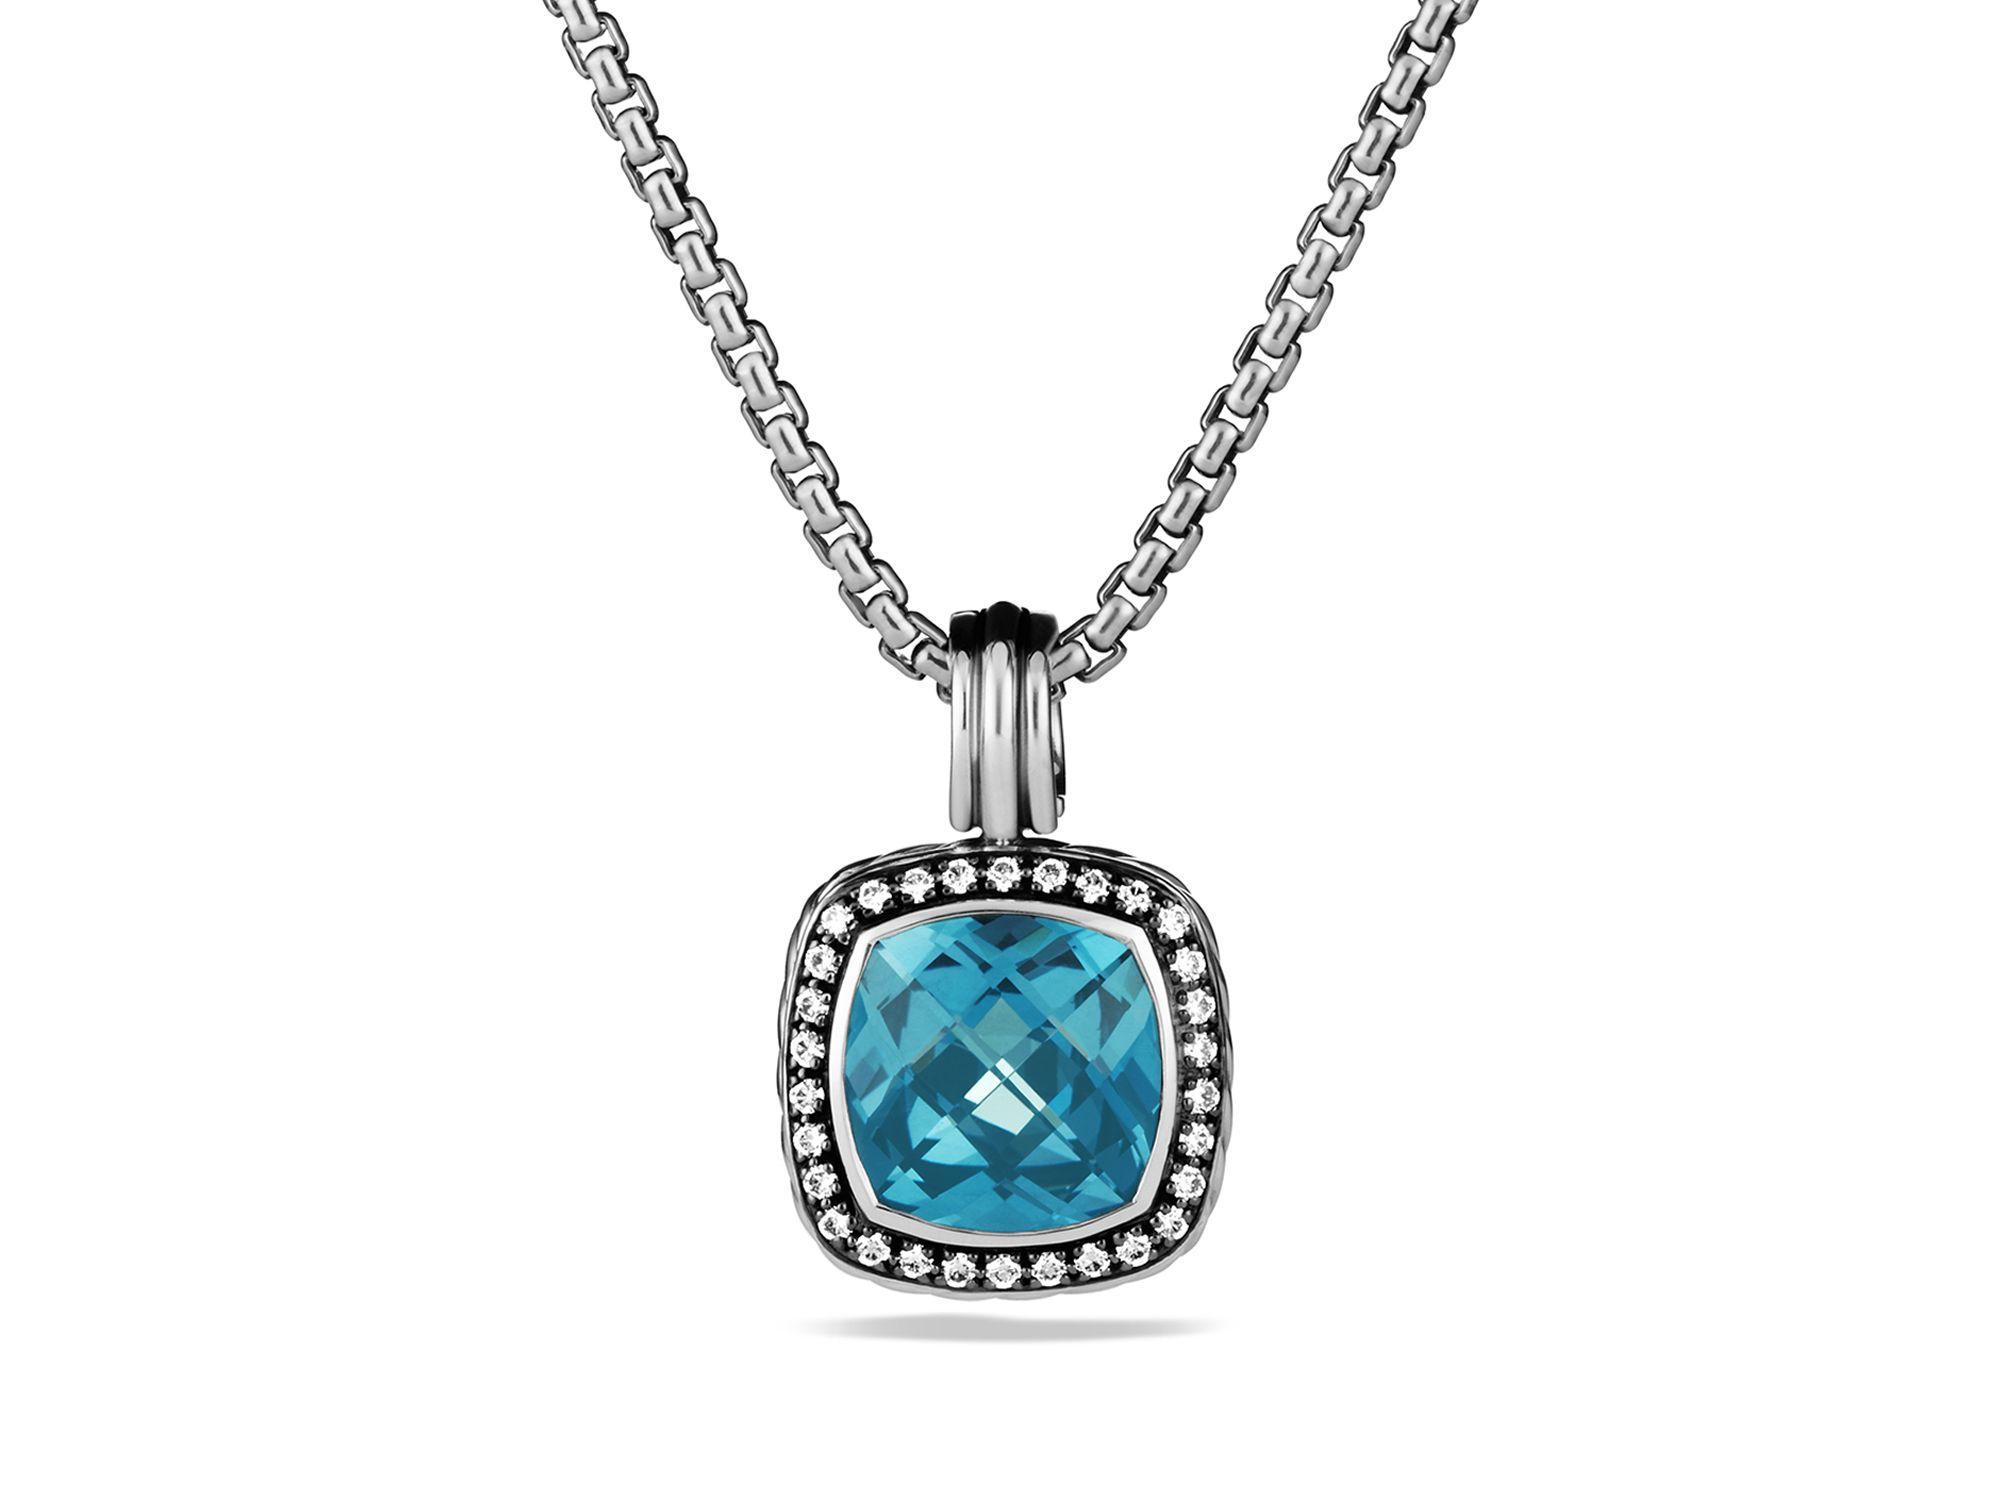 David yurman pendant necklace traumspuren saveenlarge lyst david yurman starburst pendant aloadofball Gallery